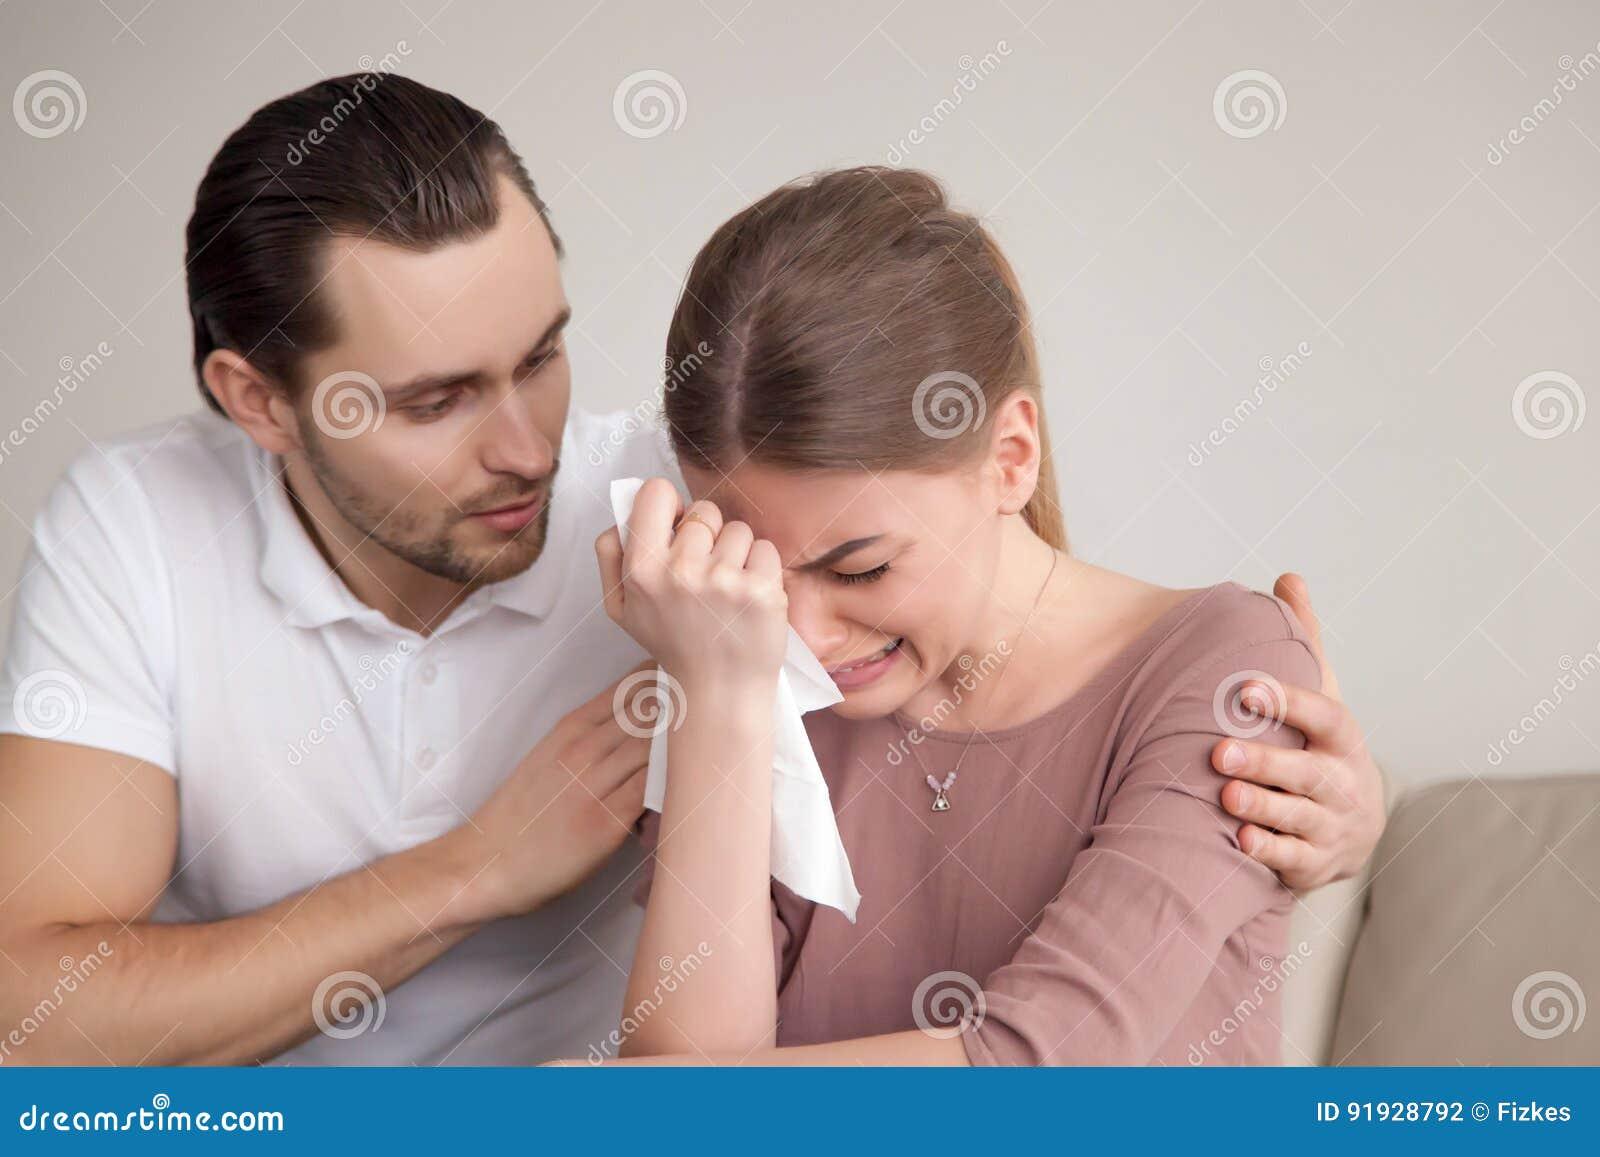 Women sobbing